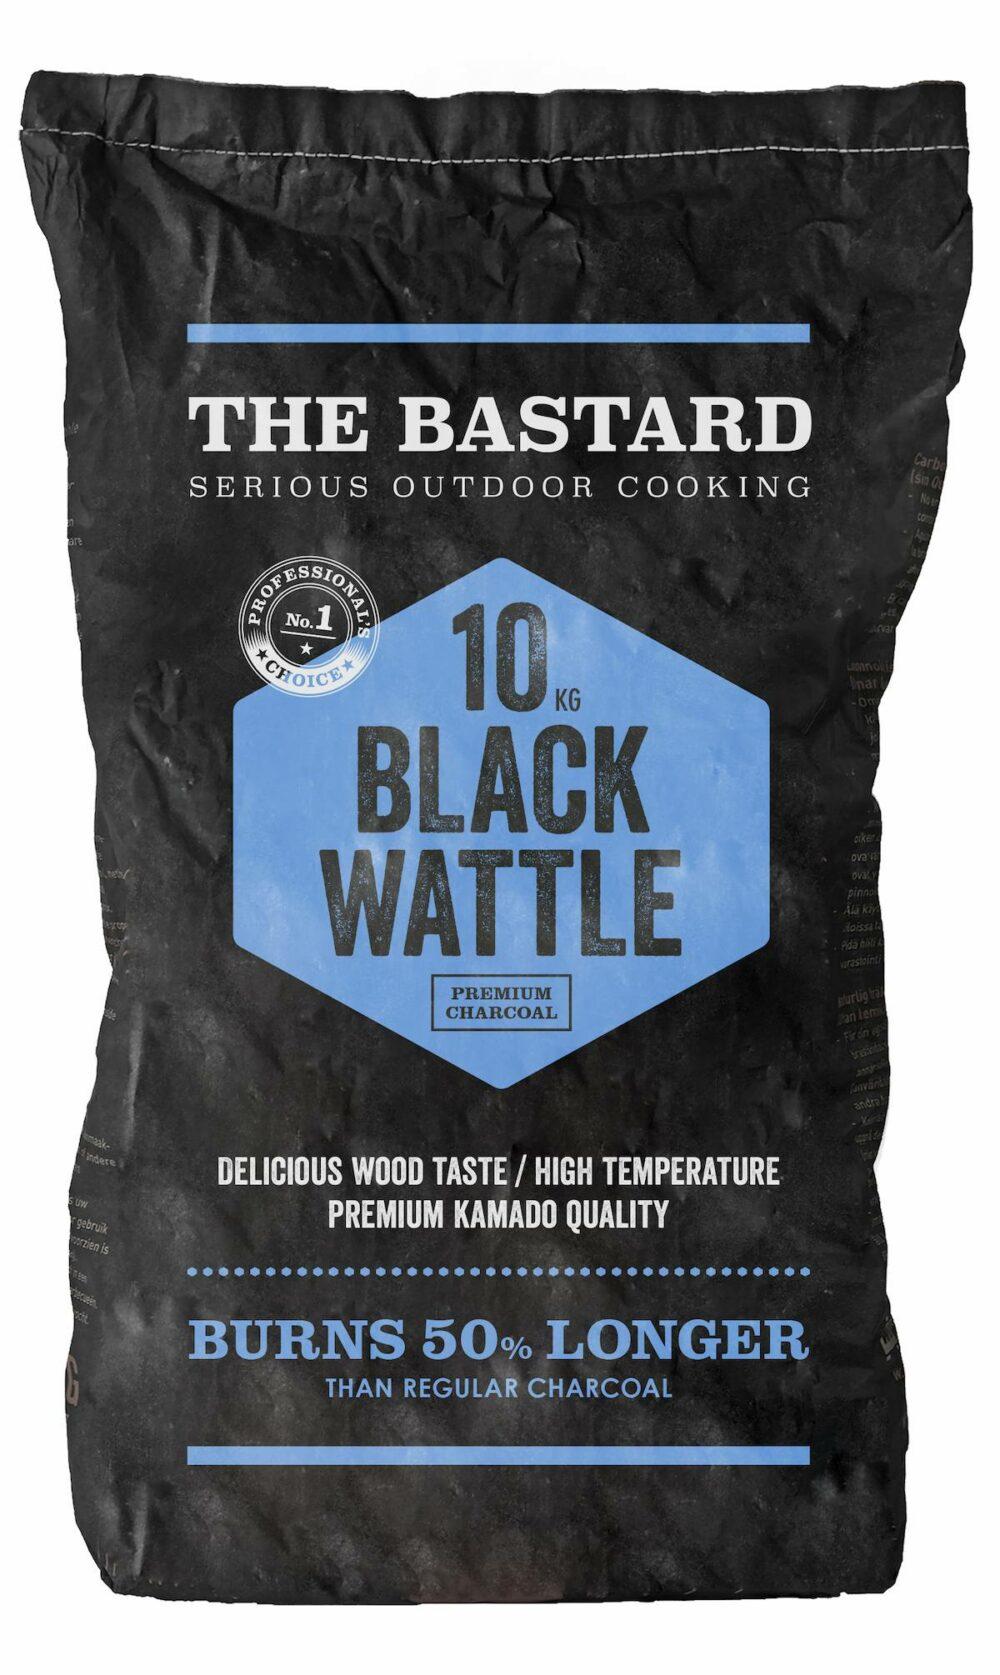 The Bastard Black Wattle 10 kg 1